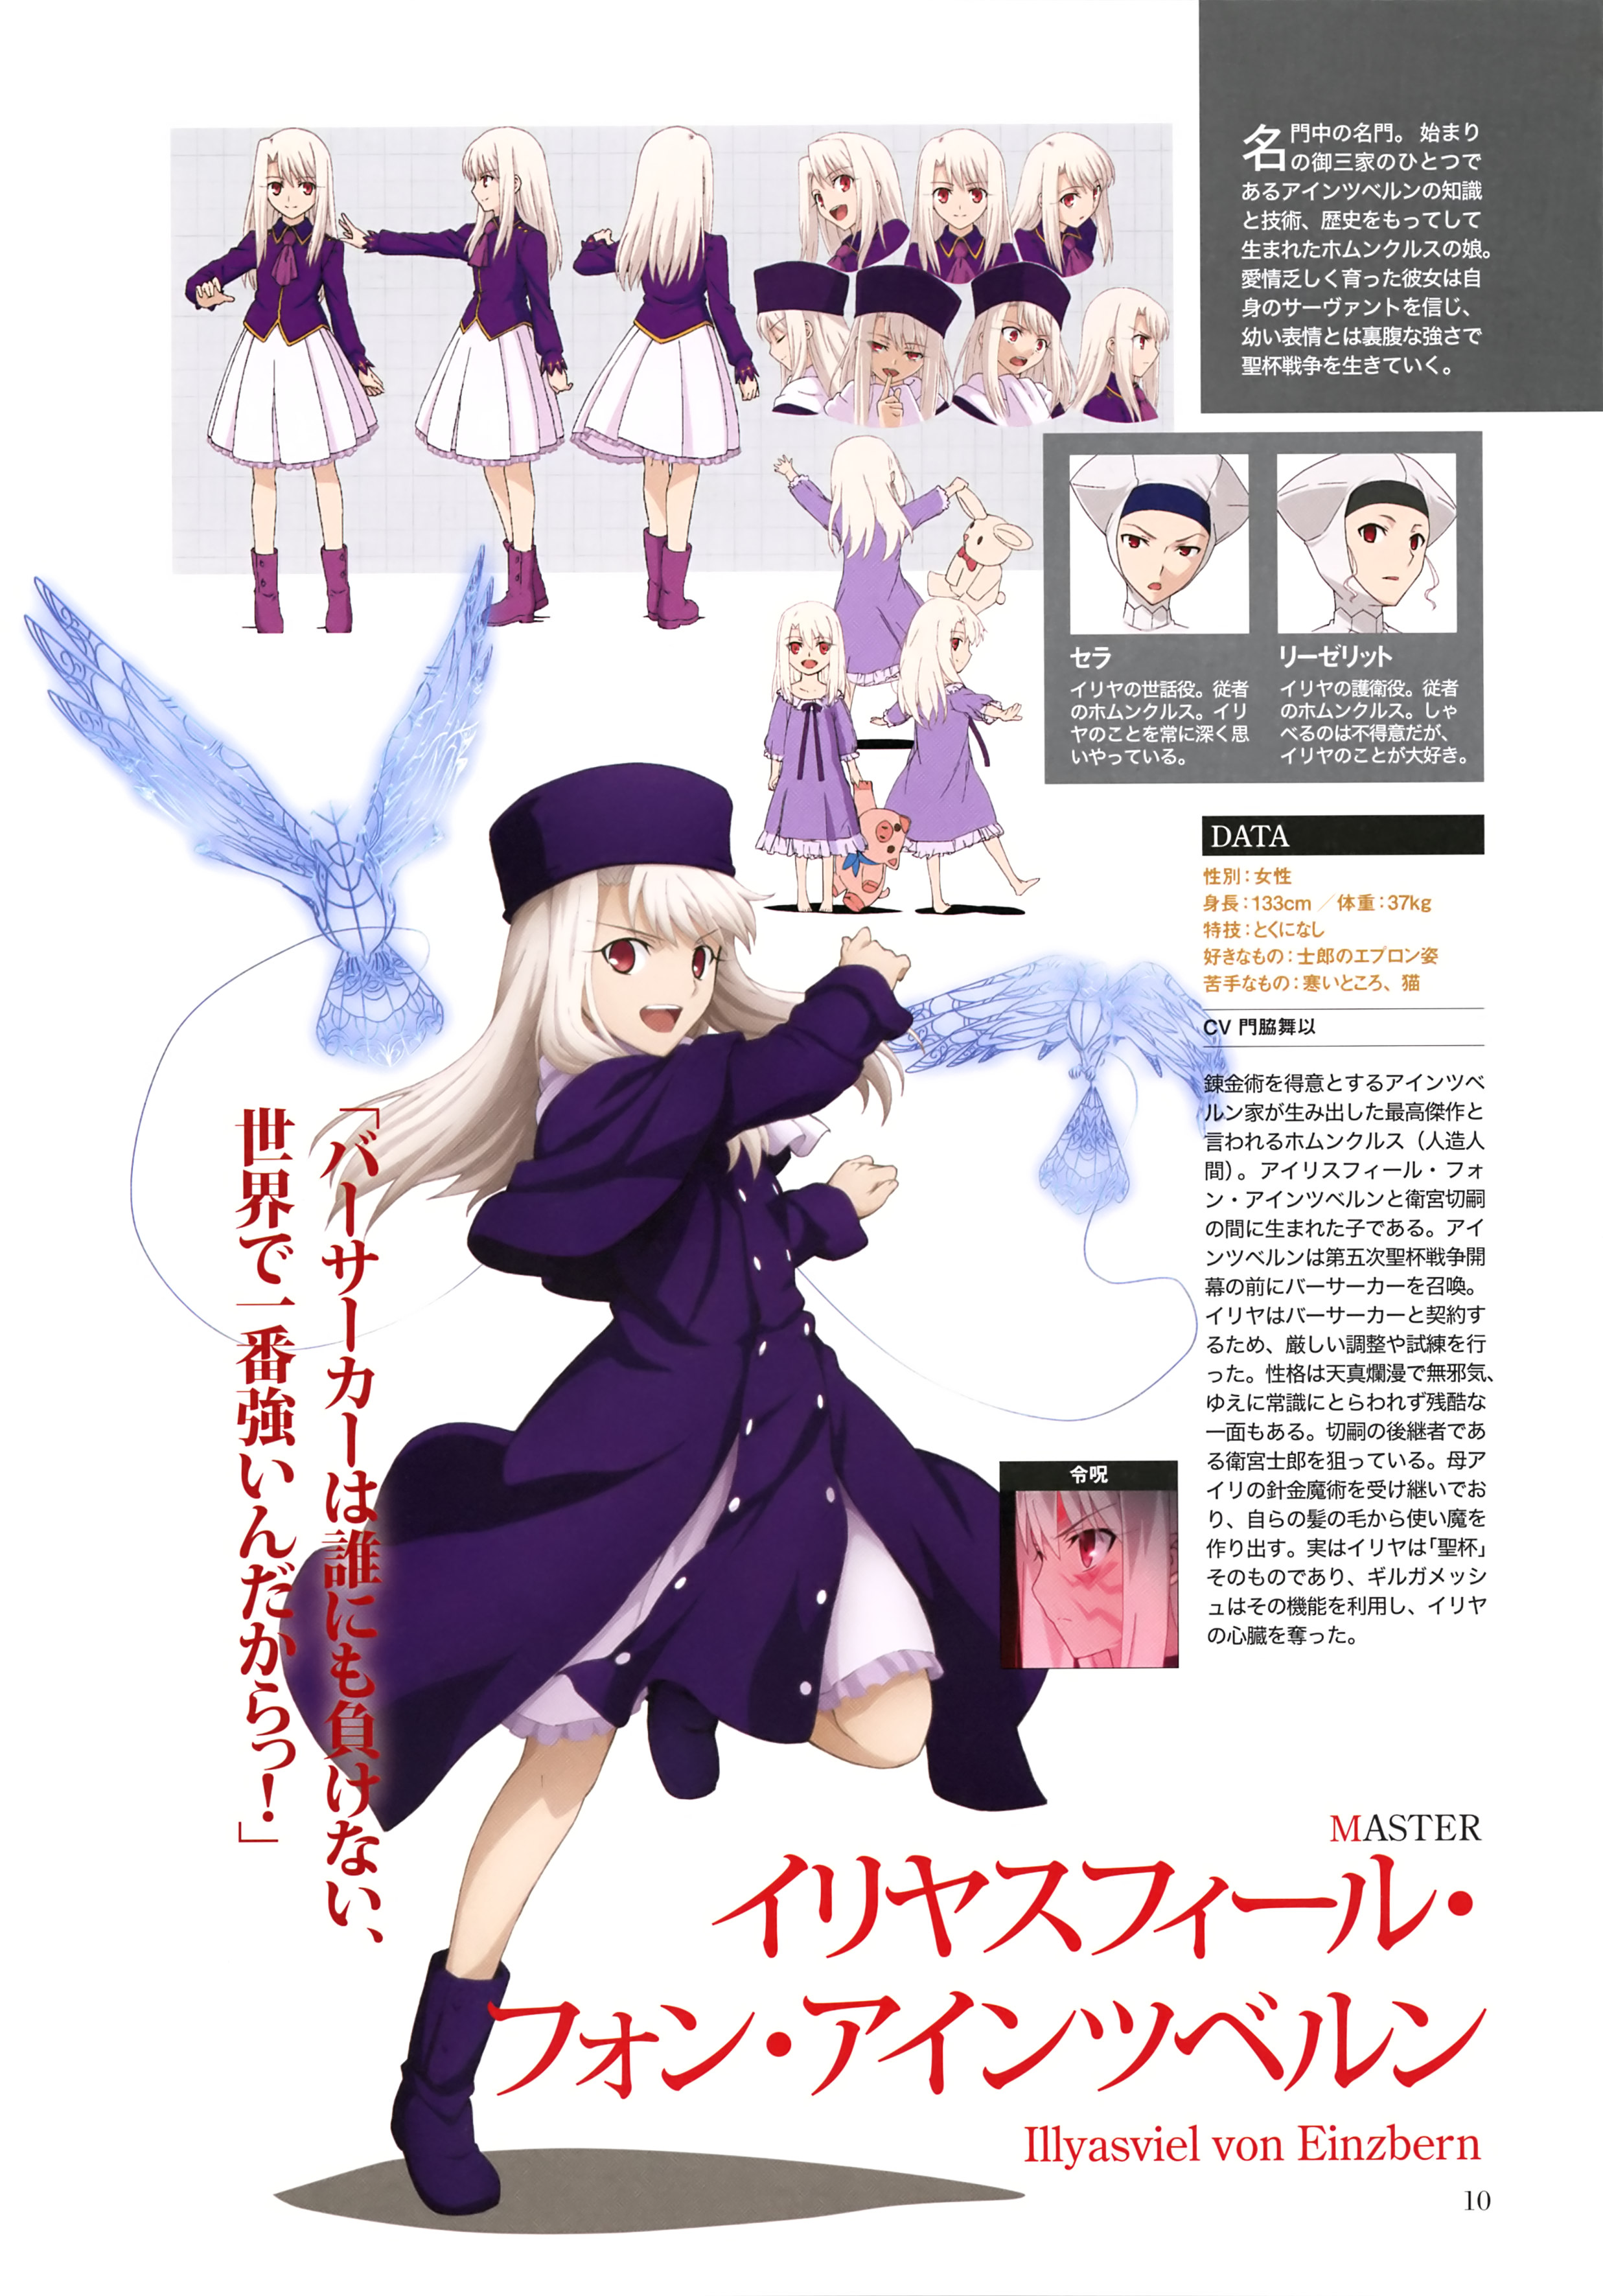 Fate Stay Night Unlimited Blade Works Mobile Wallpaper Zerochan Anime Image Board